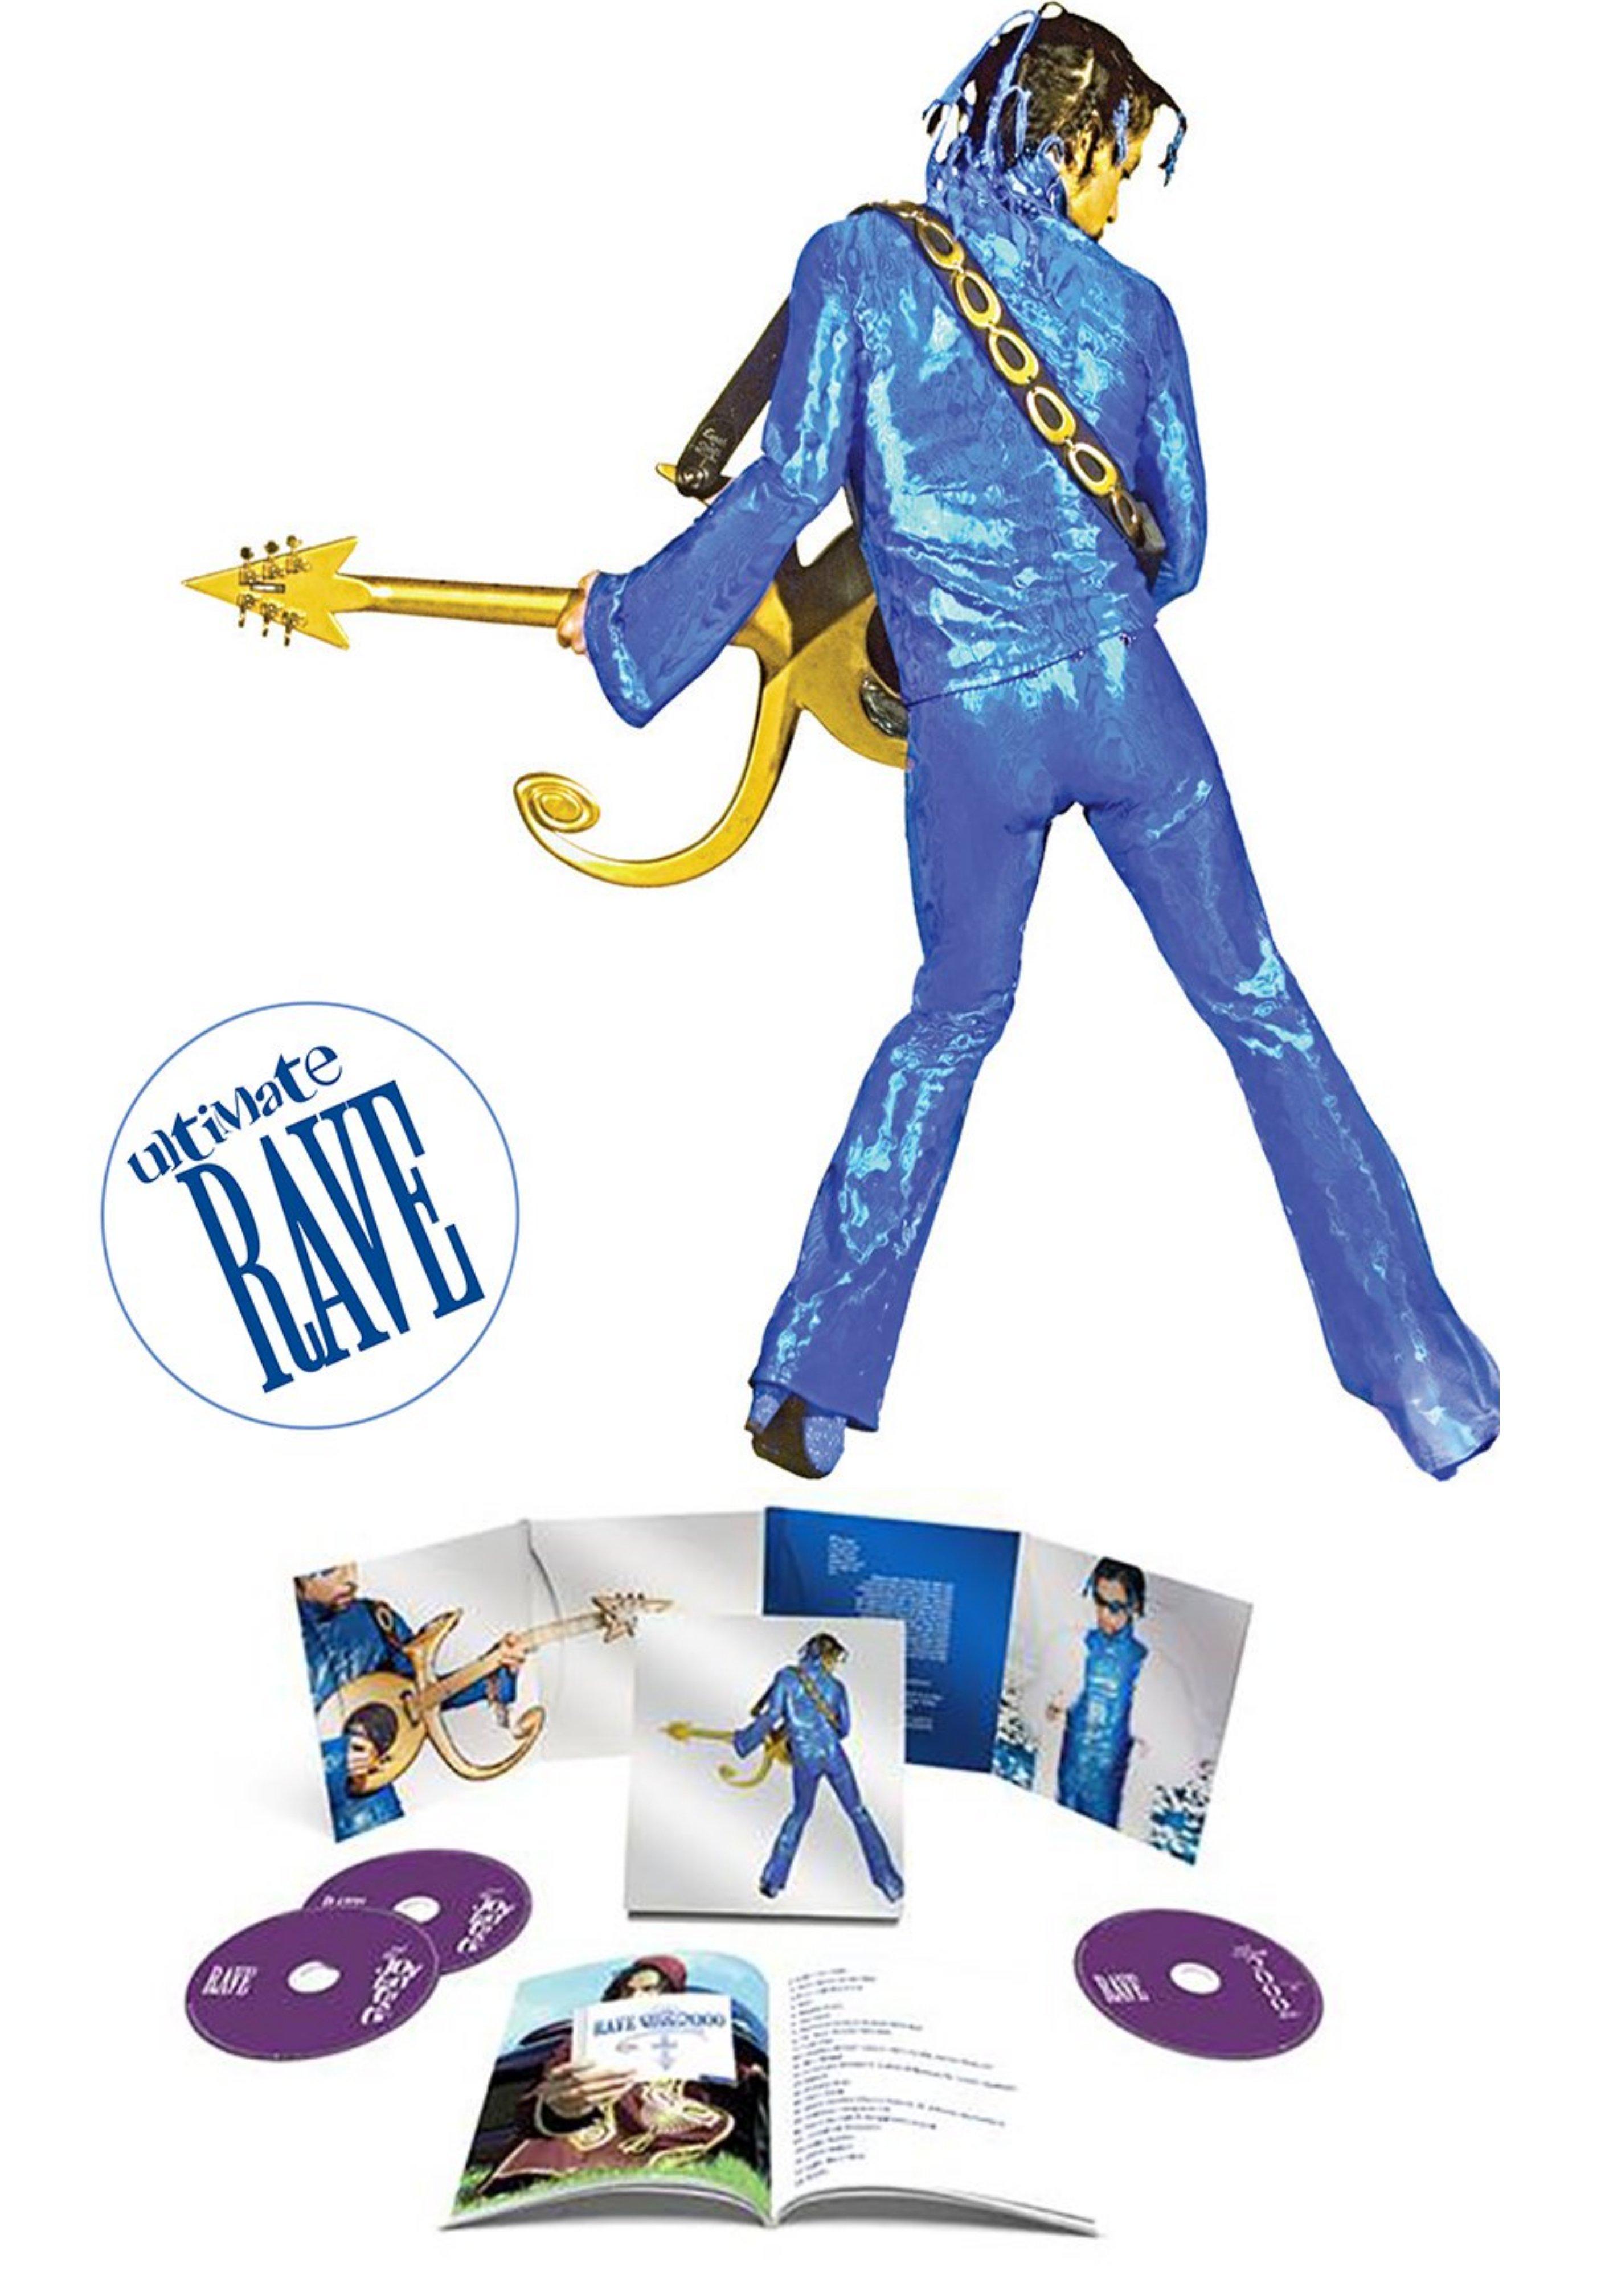 Prince - Ultimate Rave